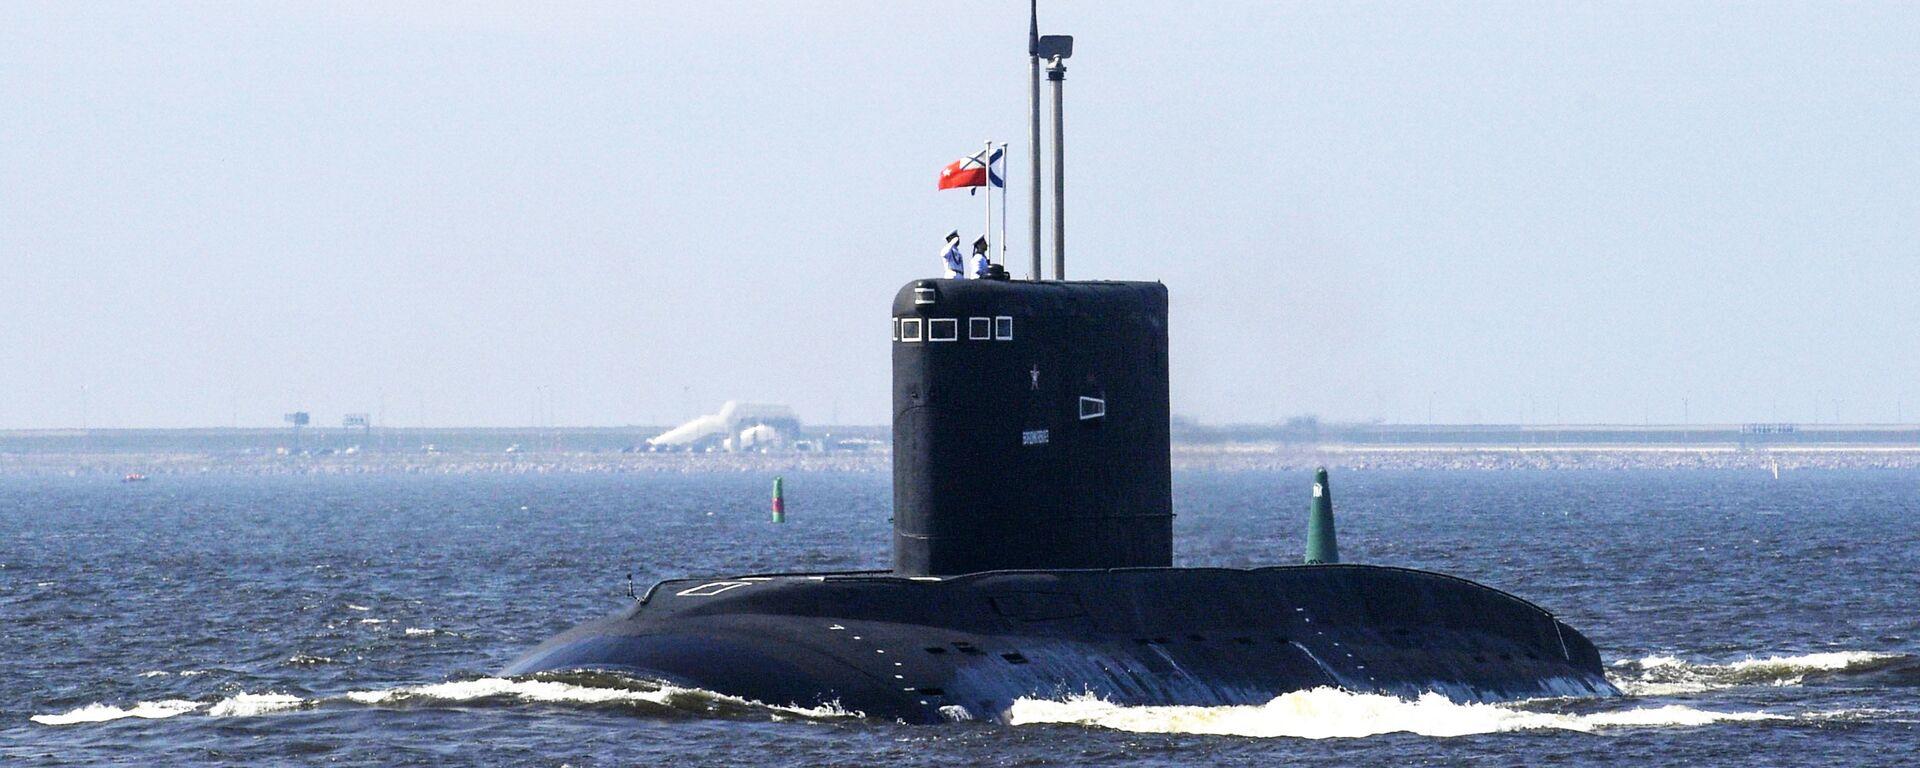 Подводная лодка Владикавказ - Sputnik Таджикистан, 1920, 19.03.2021